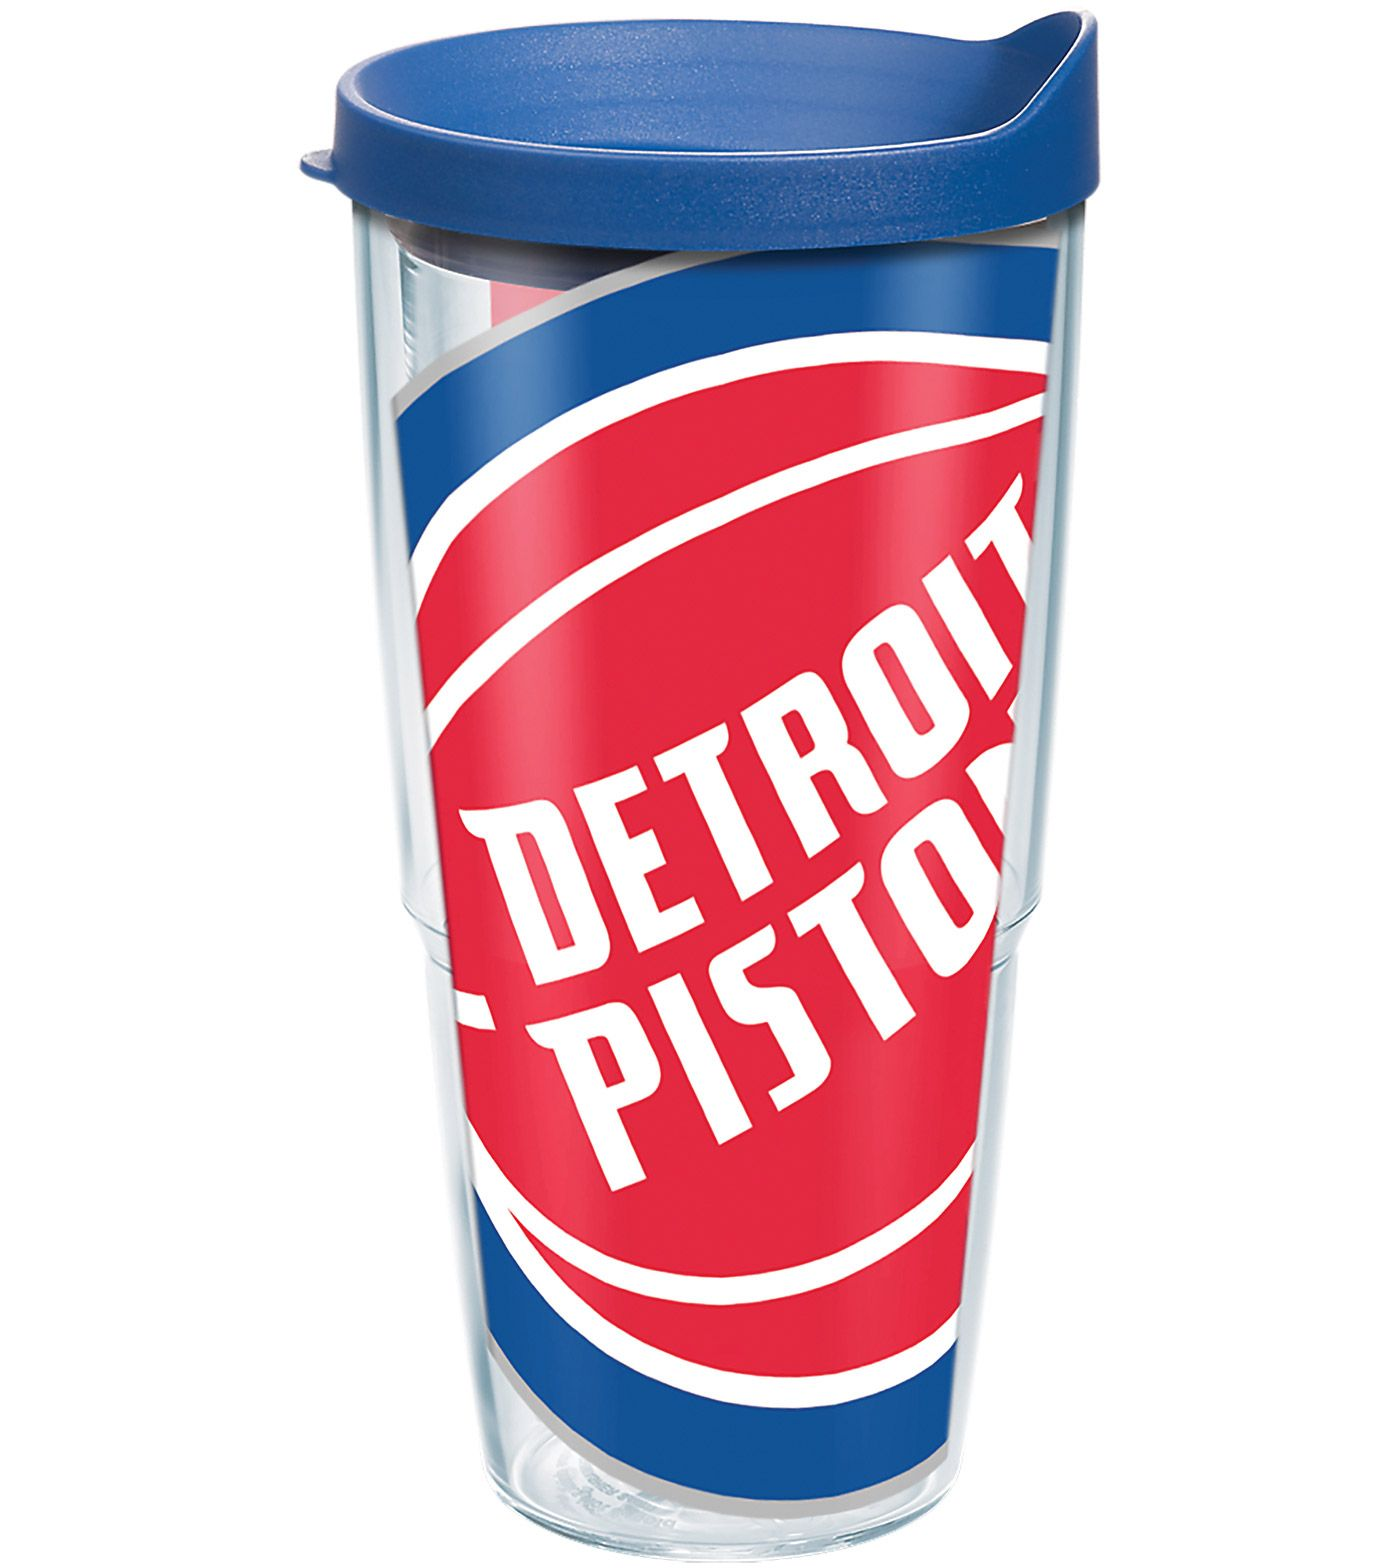 Tervis Detroit Pistons 24oz. Colossal Tumbler